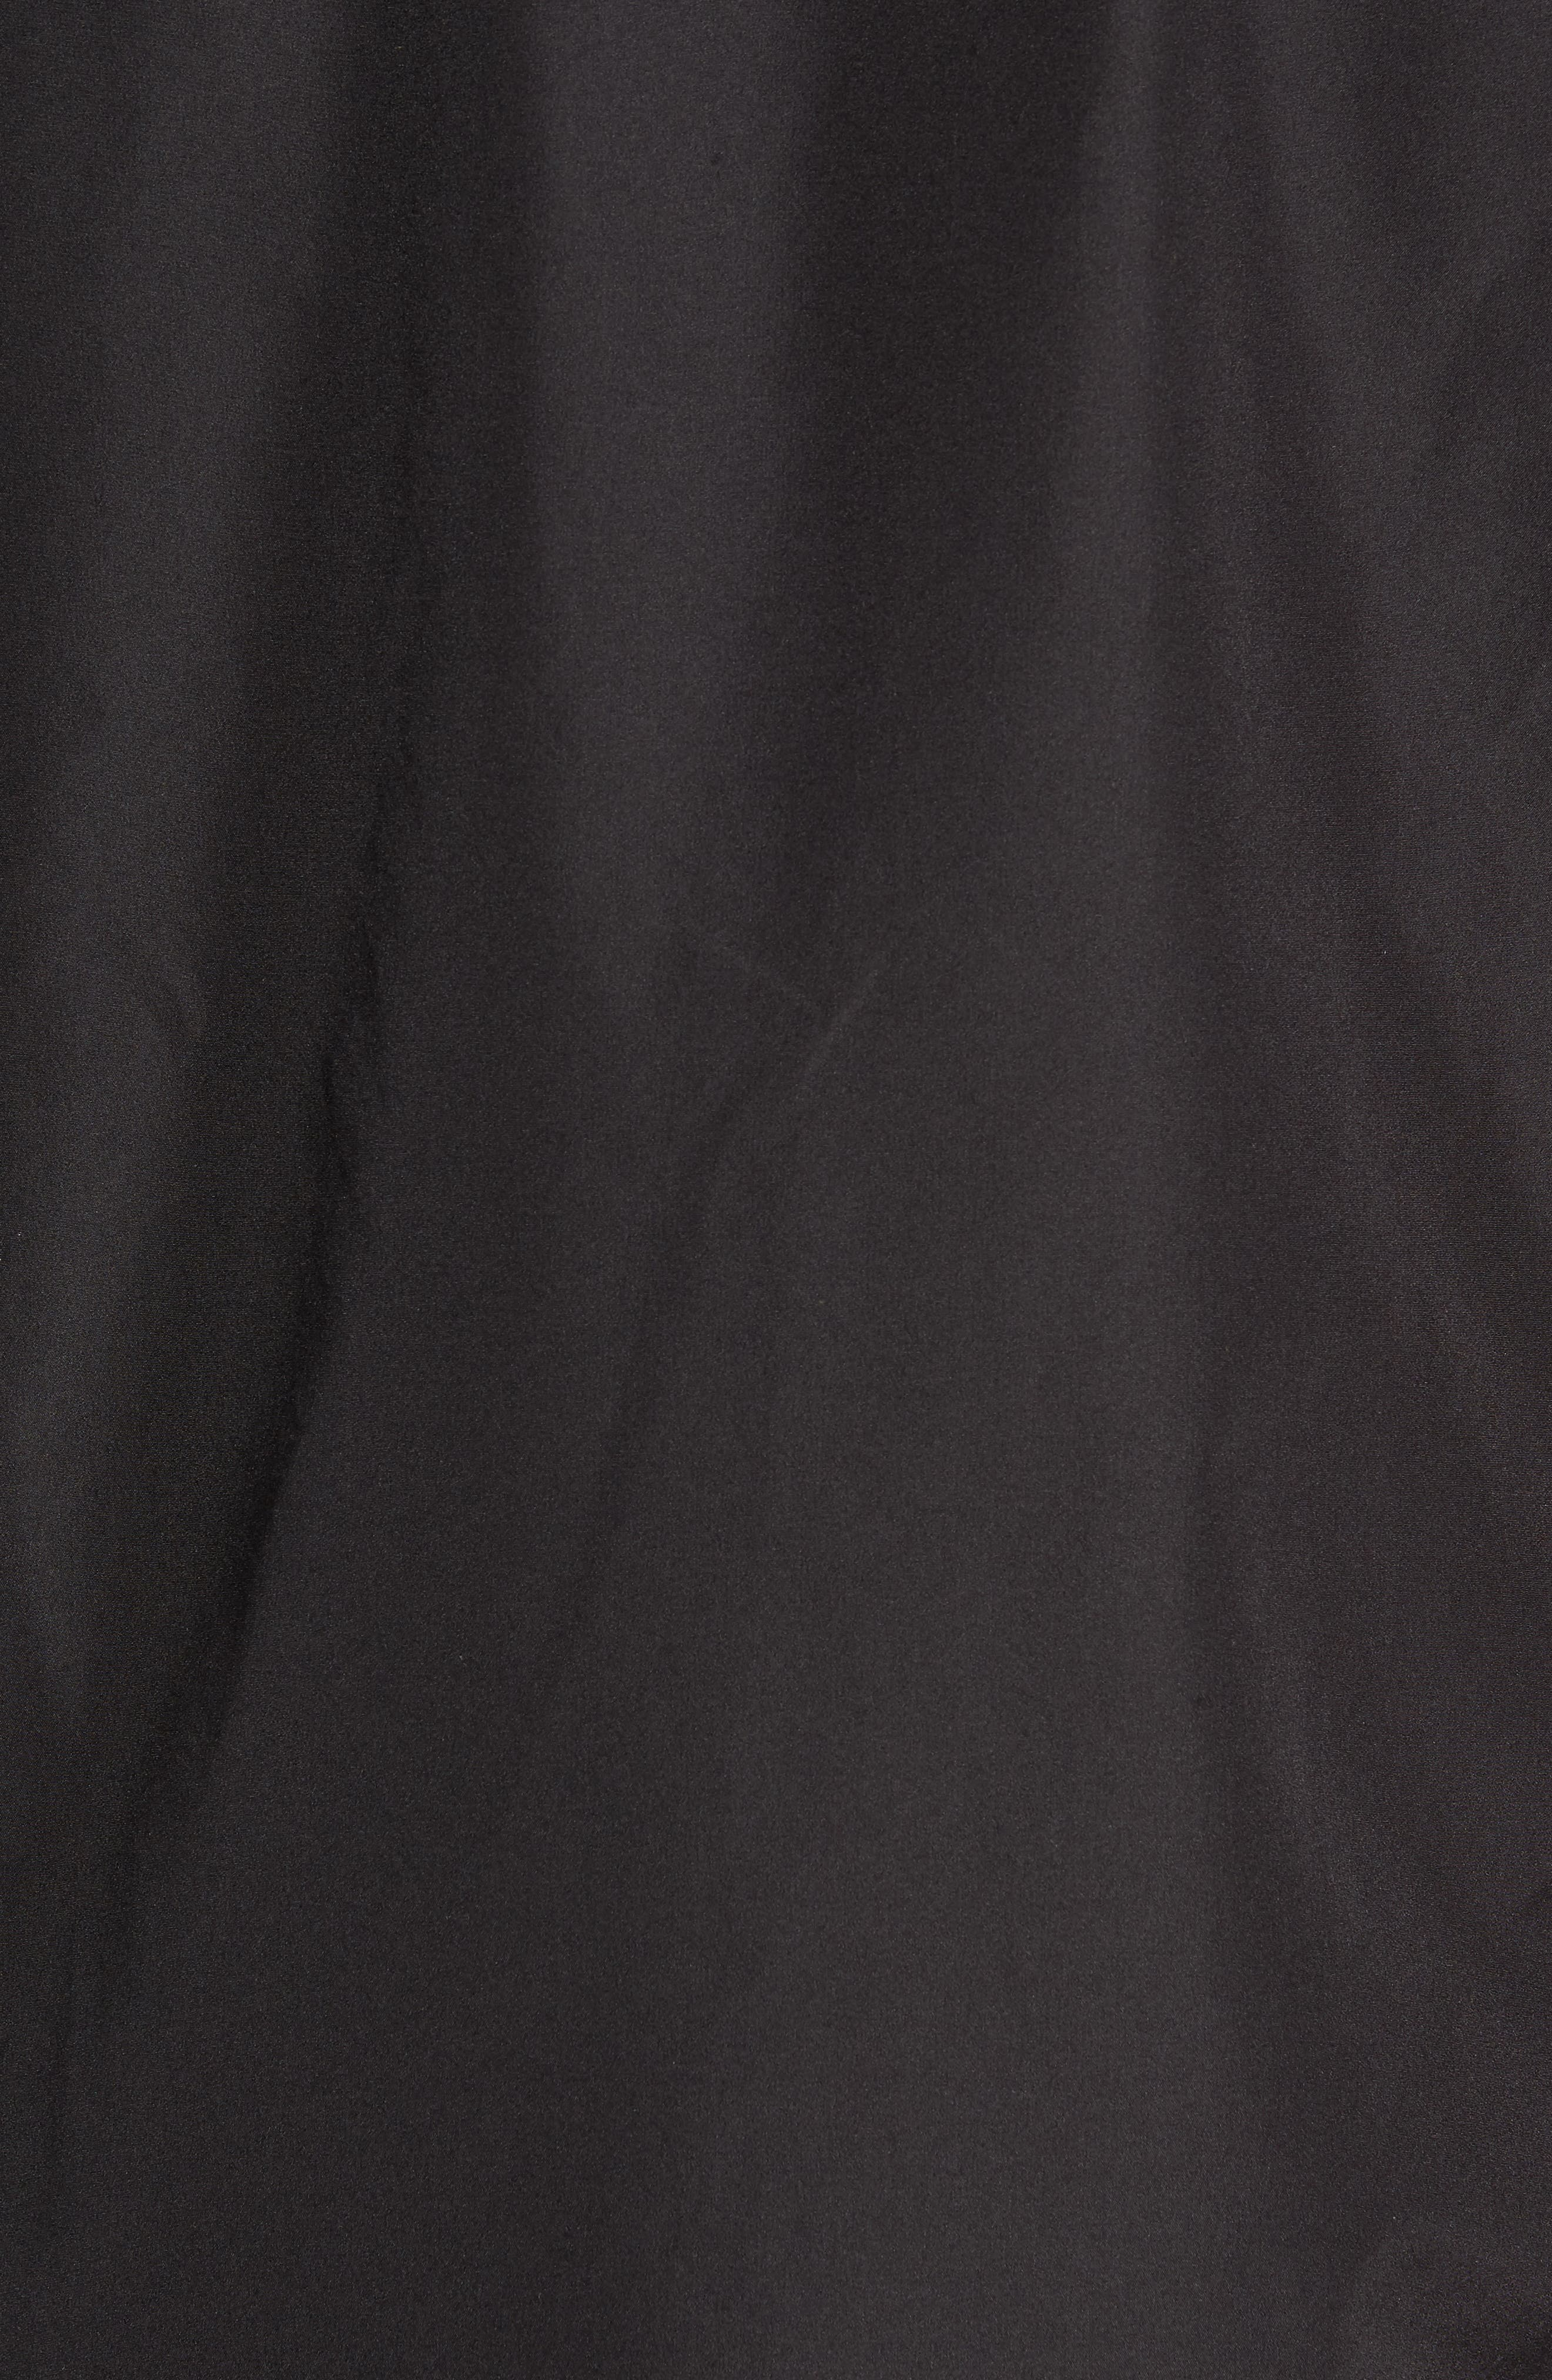 3-in-1 Rain Jacket,                             Alternate thumbnail 8, color,                             BLACK